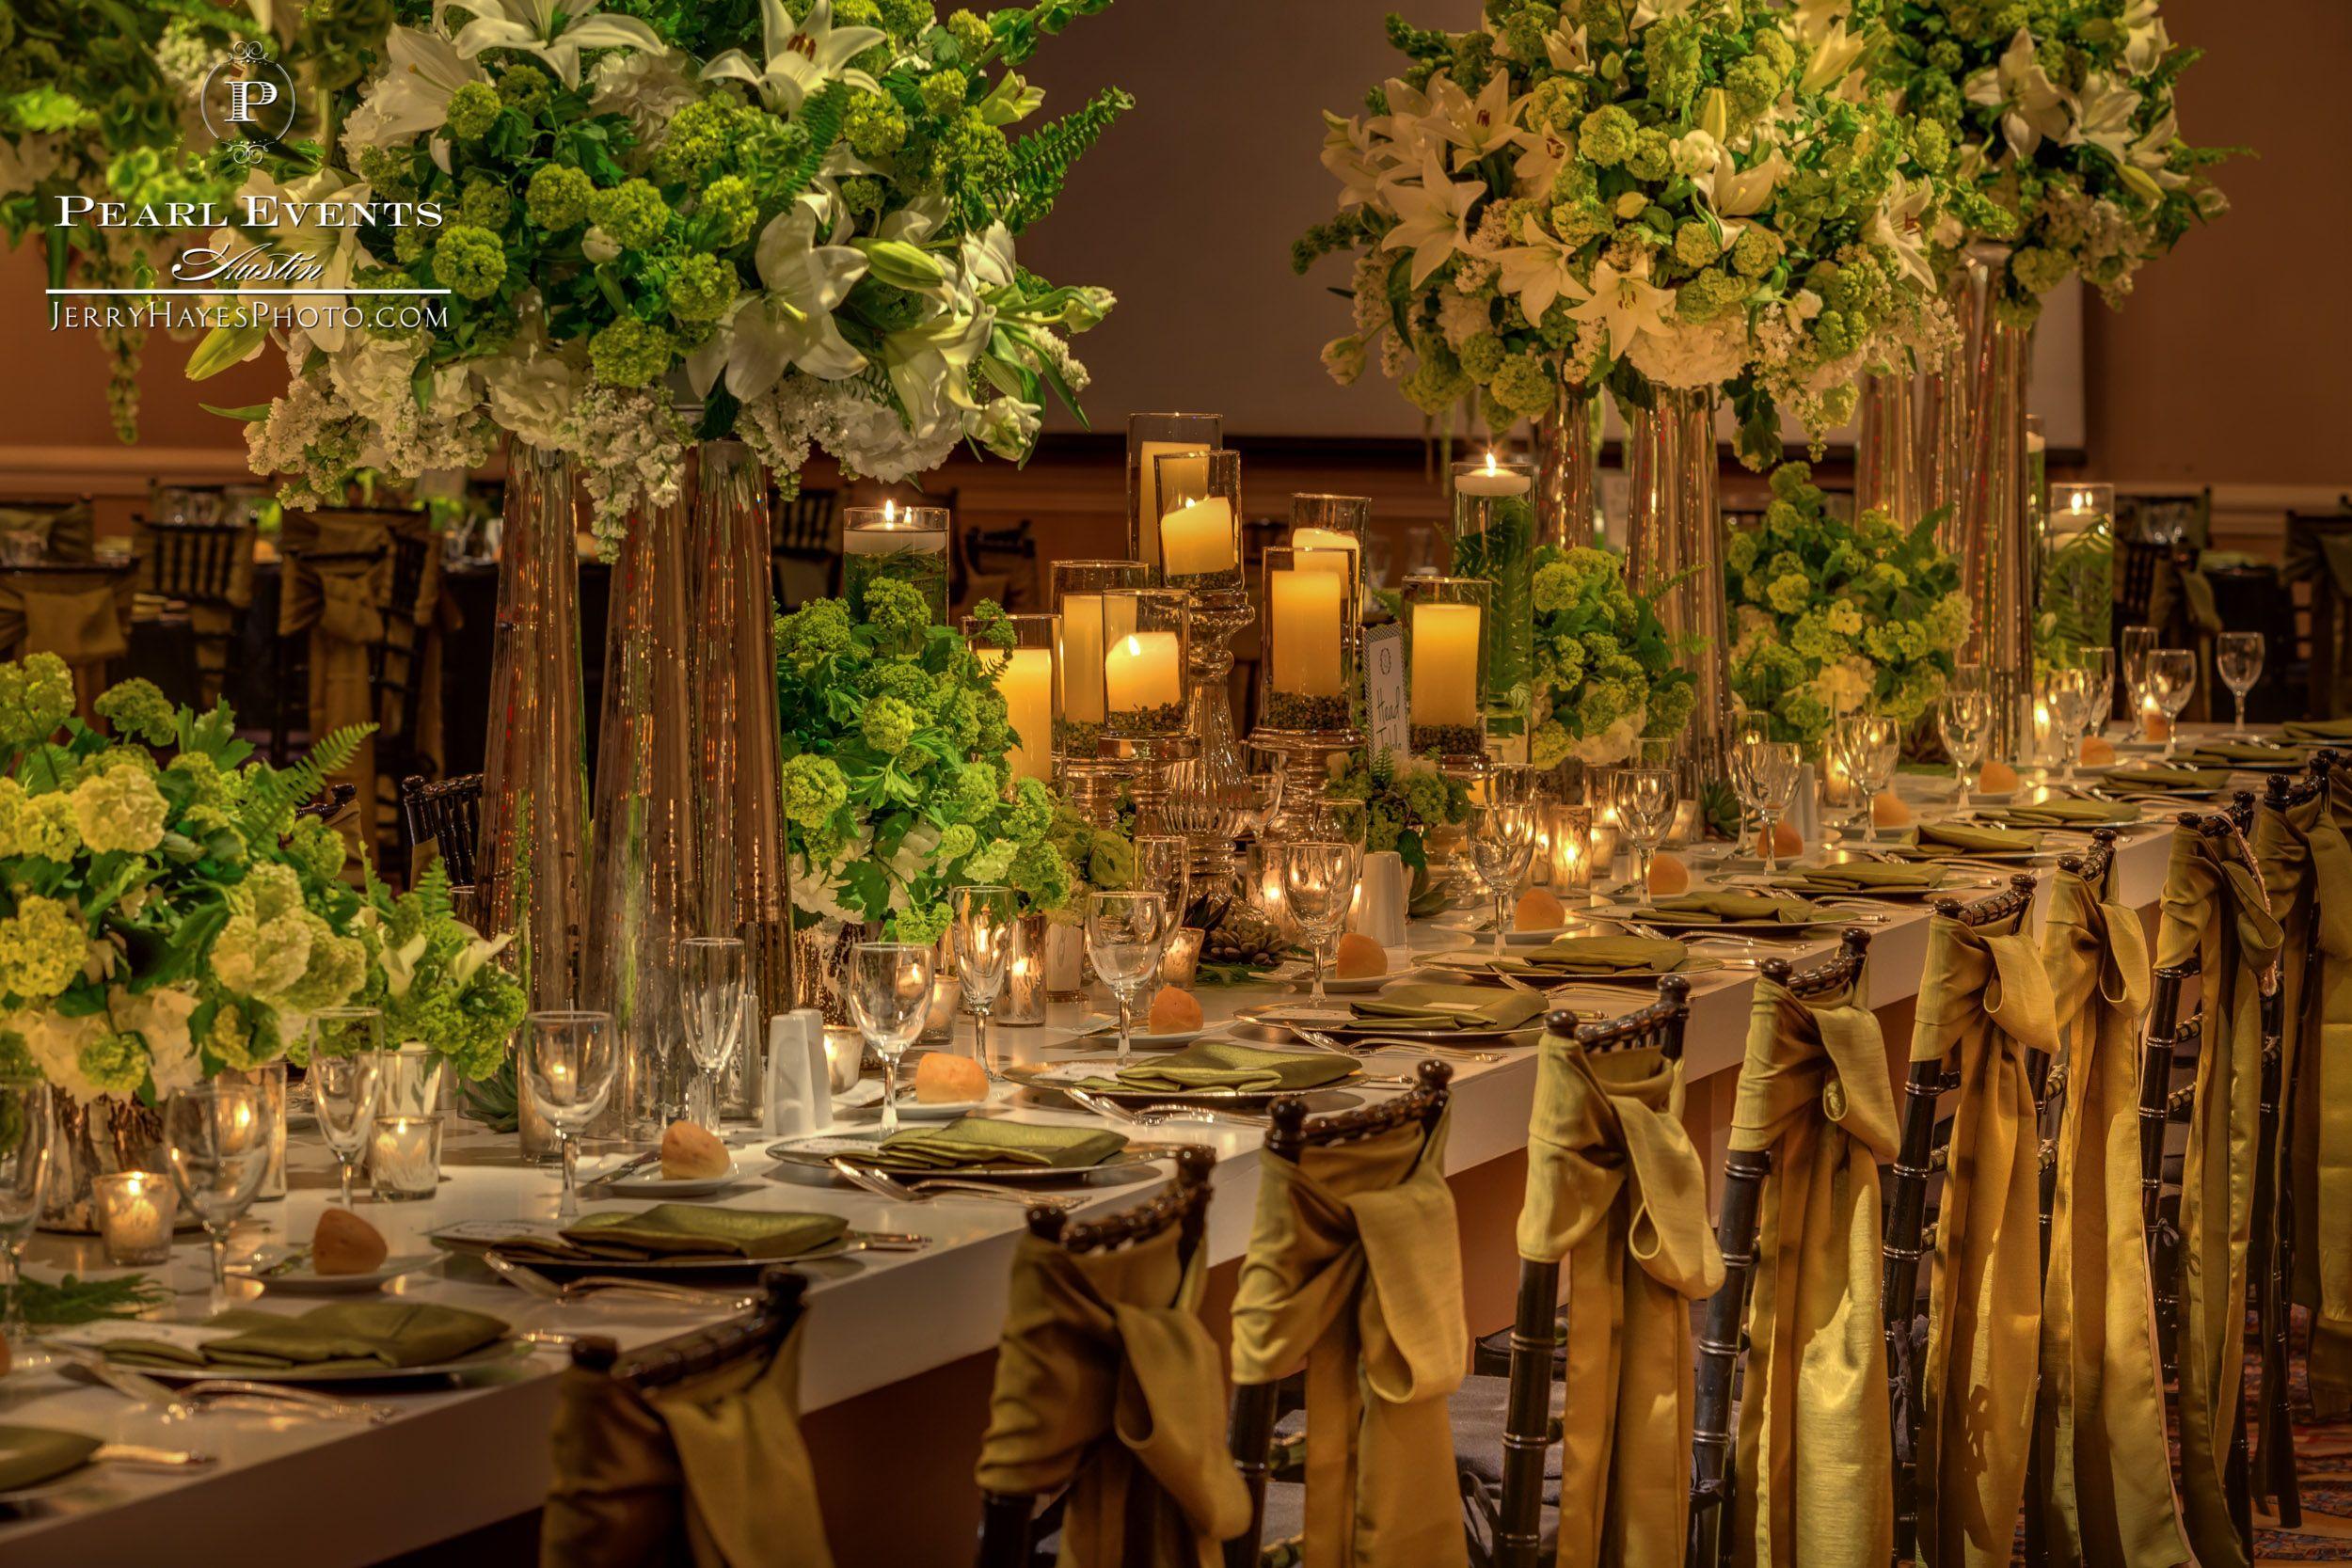 Katie Mykal Four Seasons Austin Tx Premiere Party Central Rentals Bouquets Of Austin Luxury Wedding Centerpieces Pearl Events Austin Pearl Events